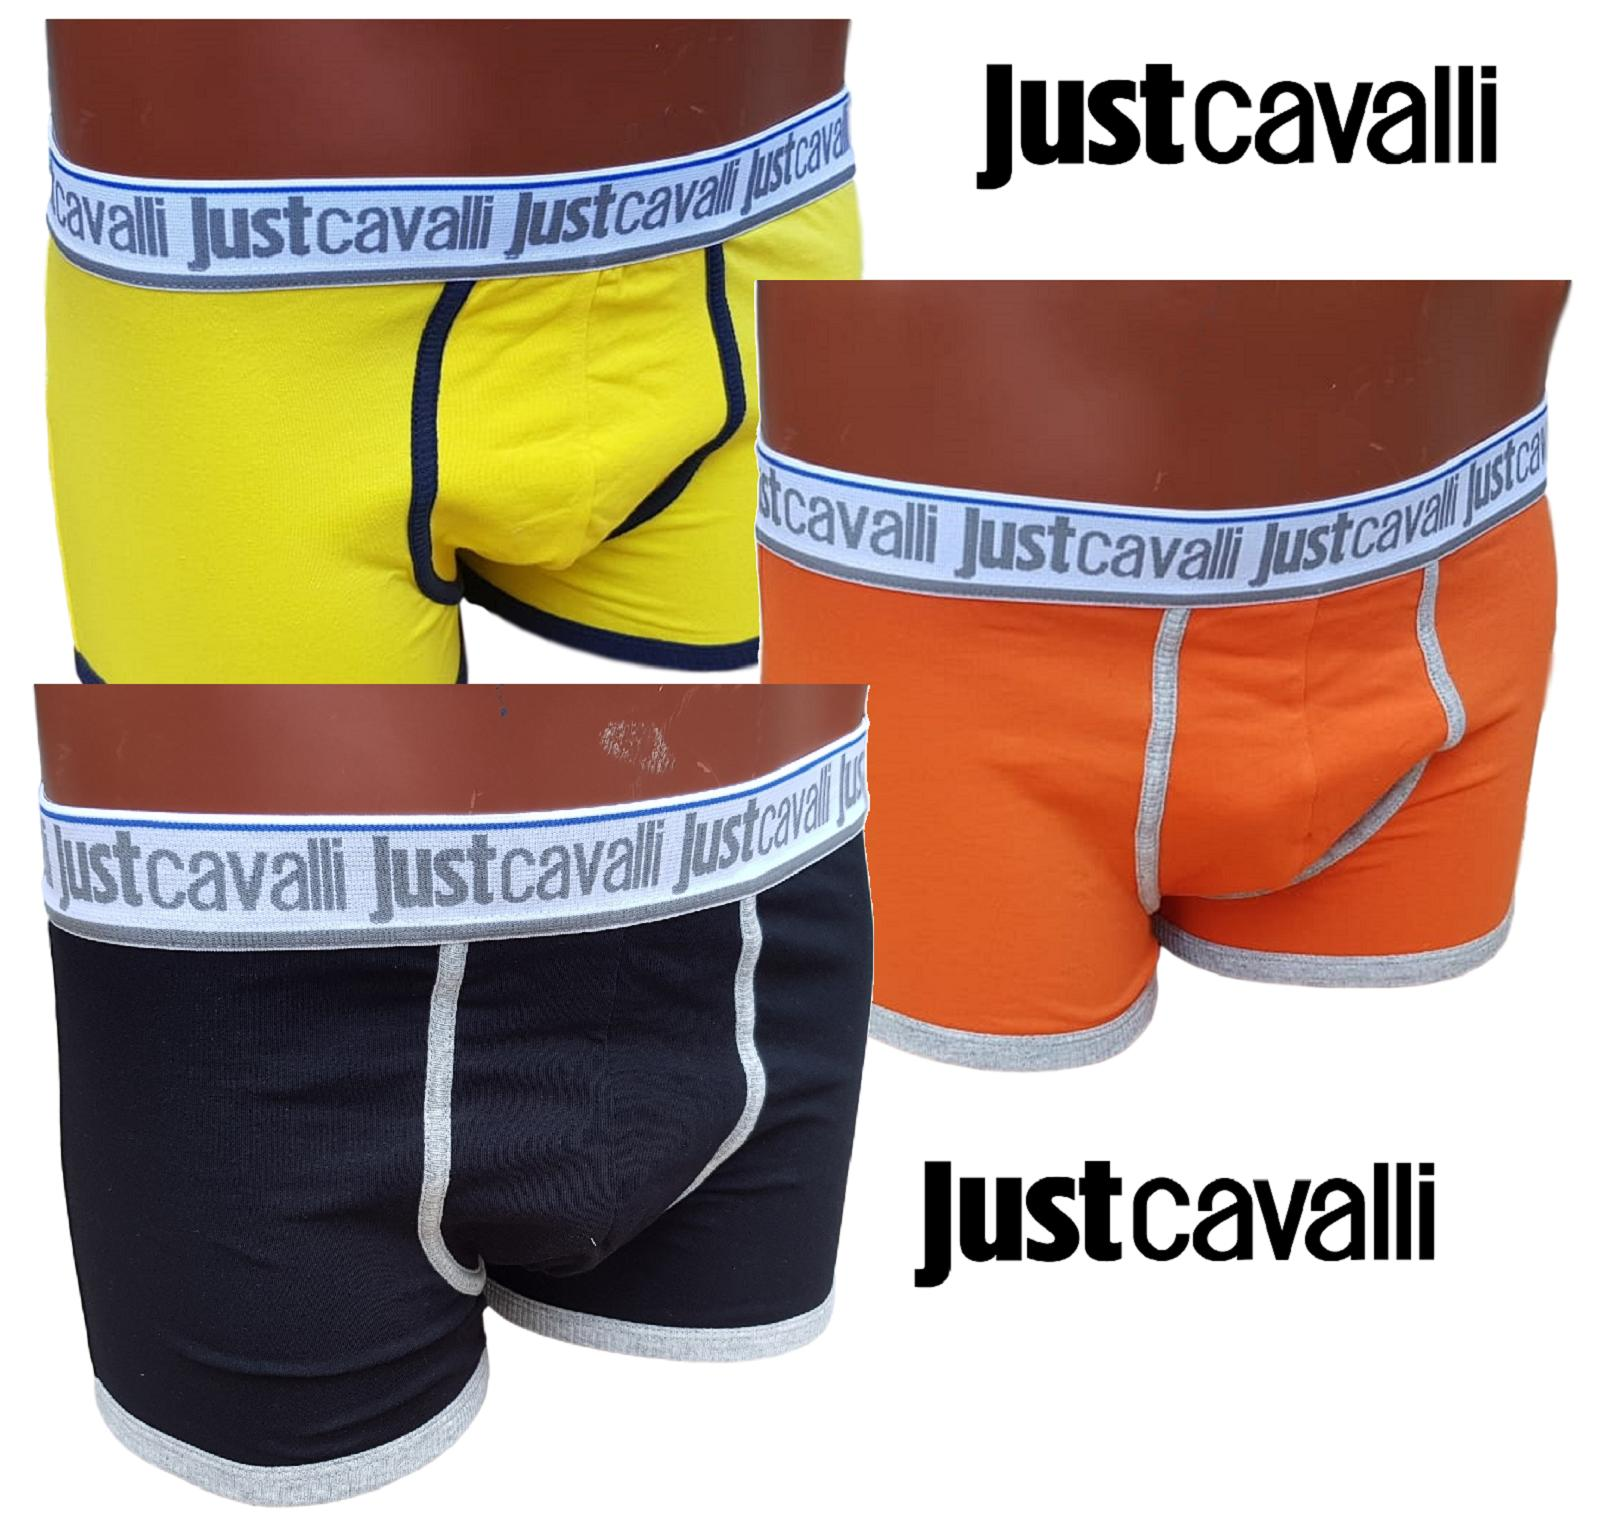 JUST CAVALLI A11. Boxer uomo elastico esterno. 95% Cotone - 5% Elastam